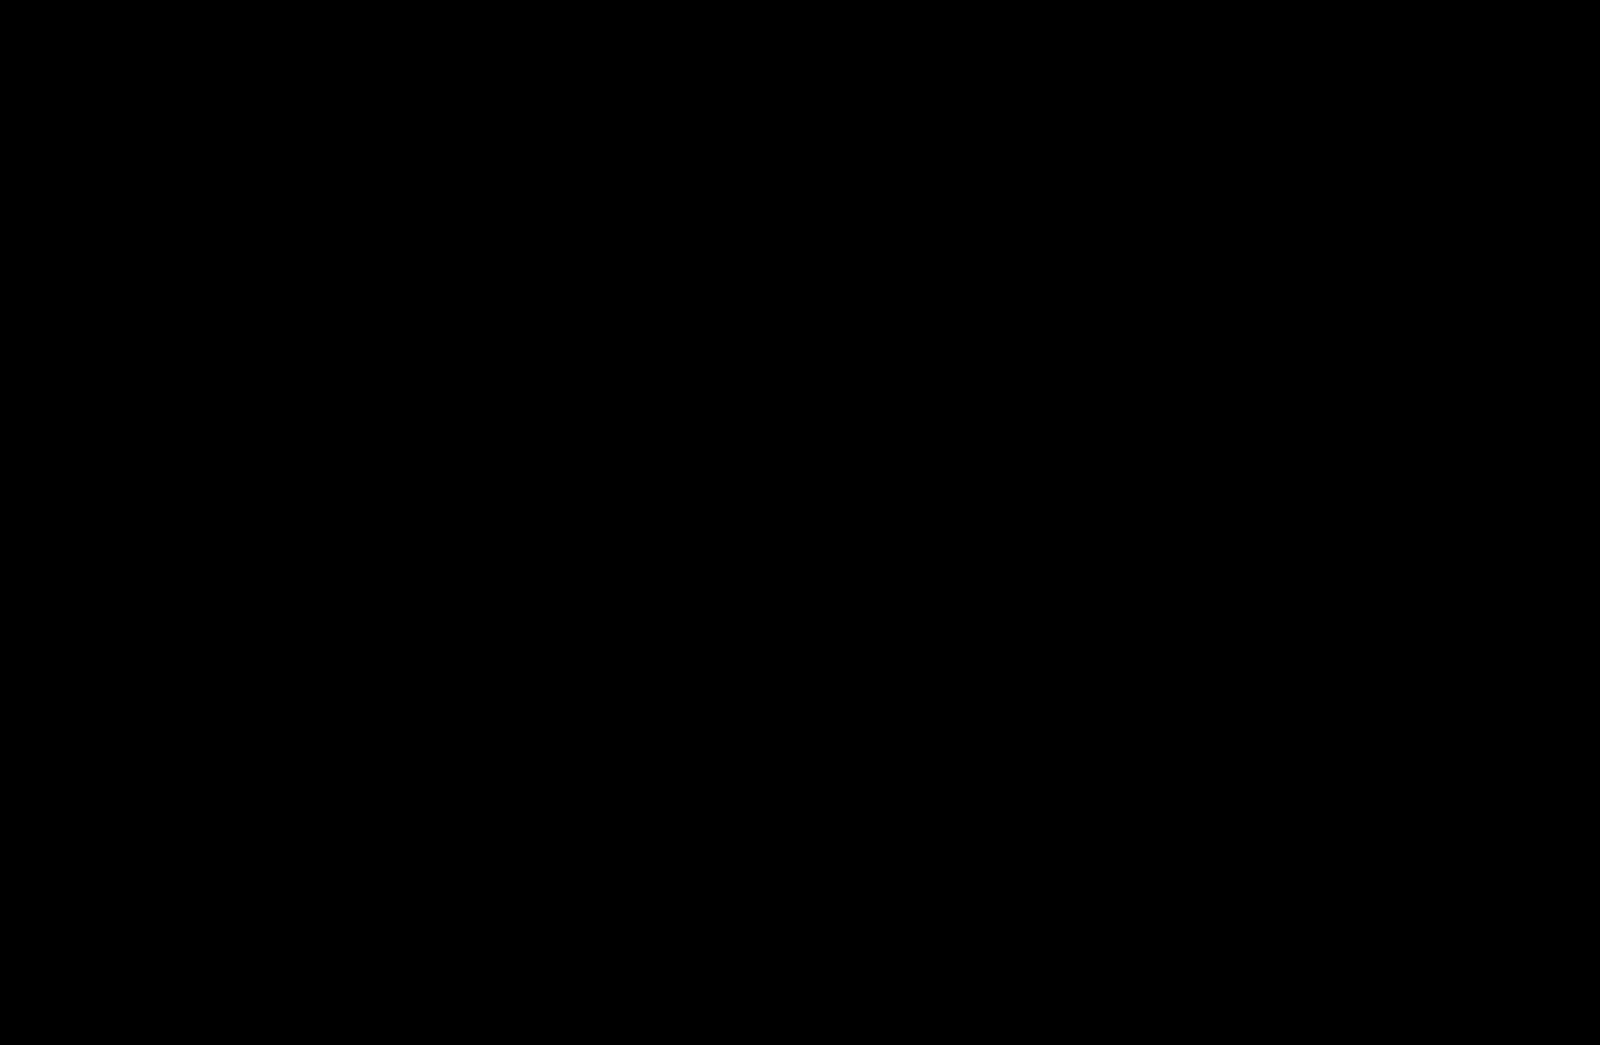 Besonderer schwedischer Klapptisch um 1840